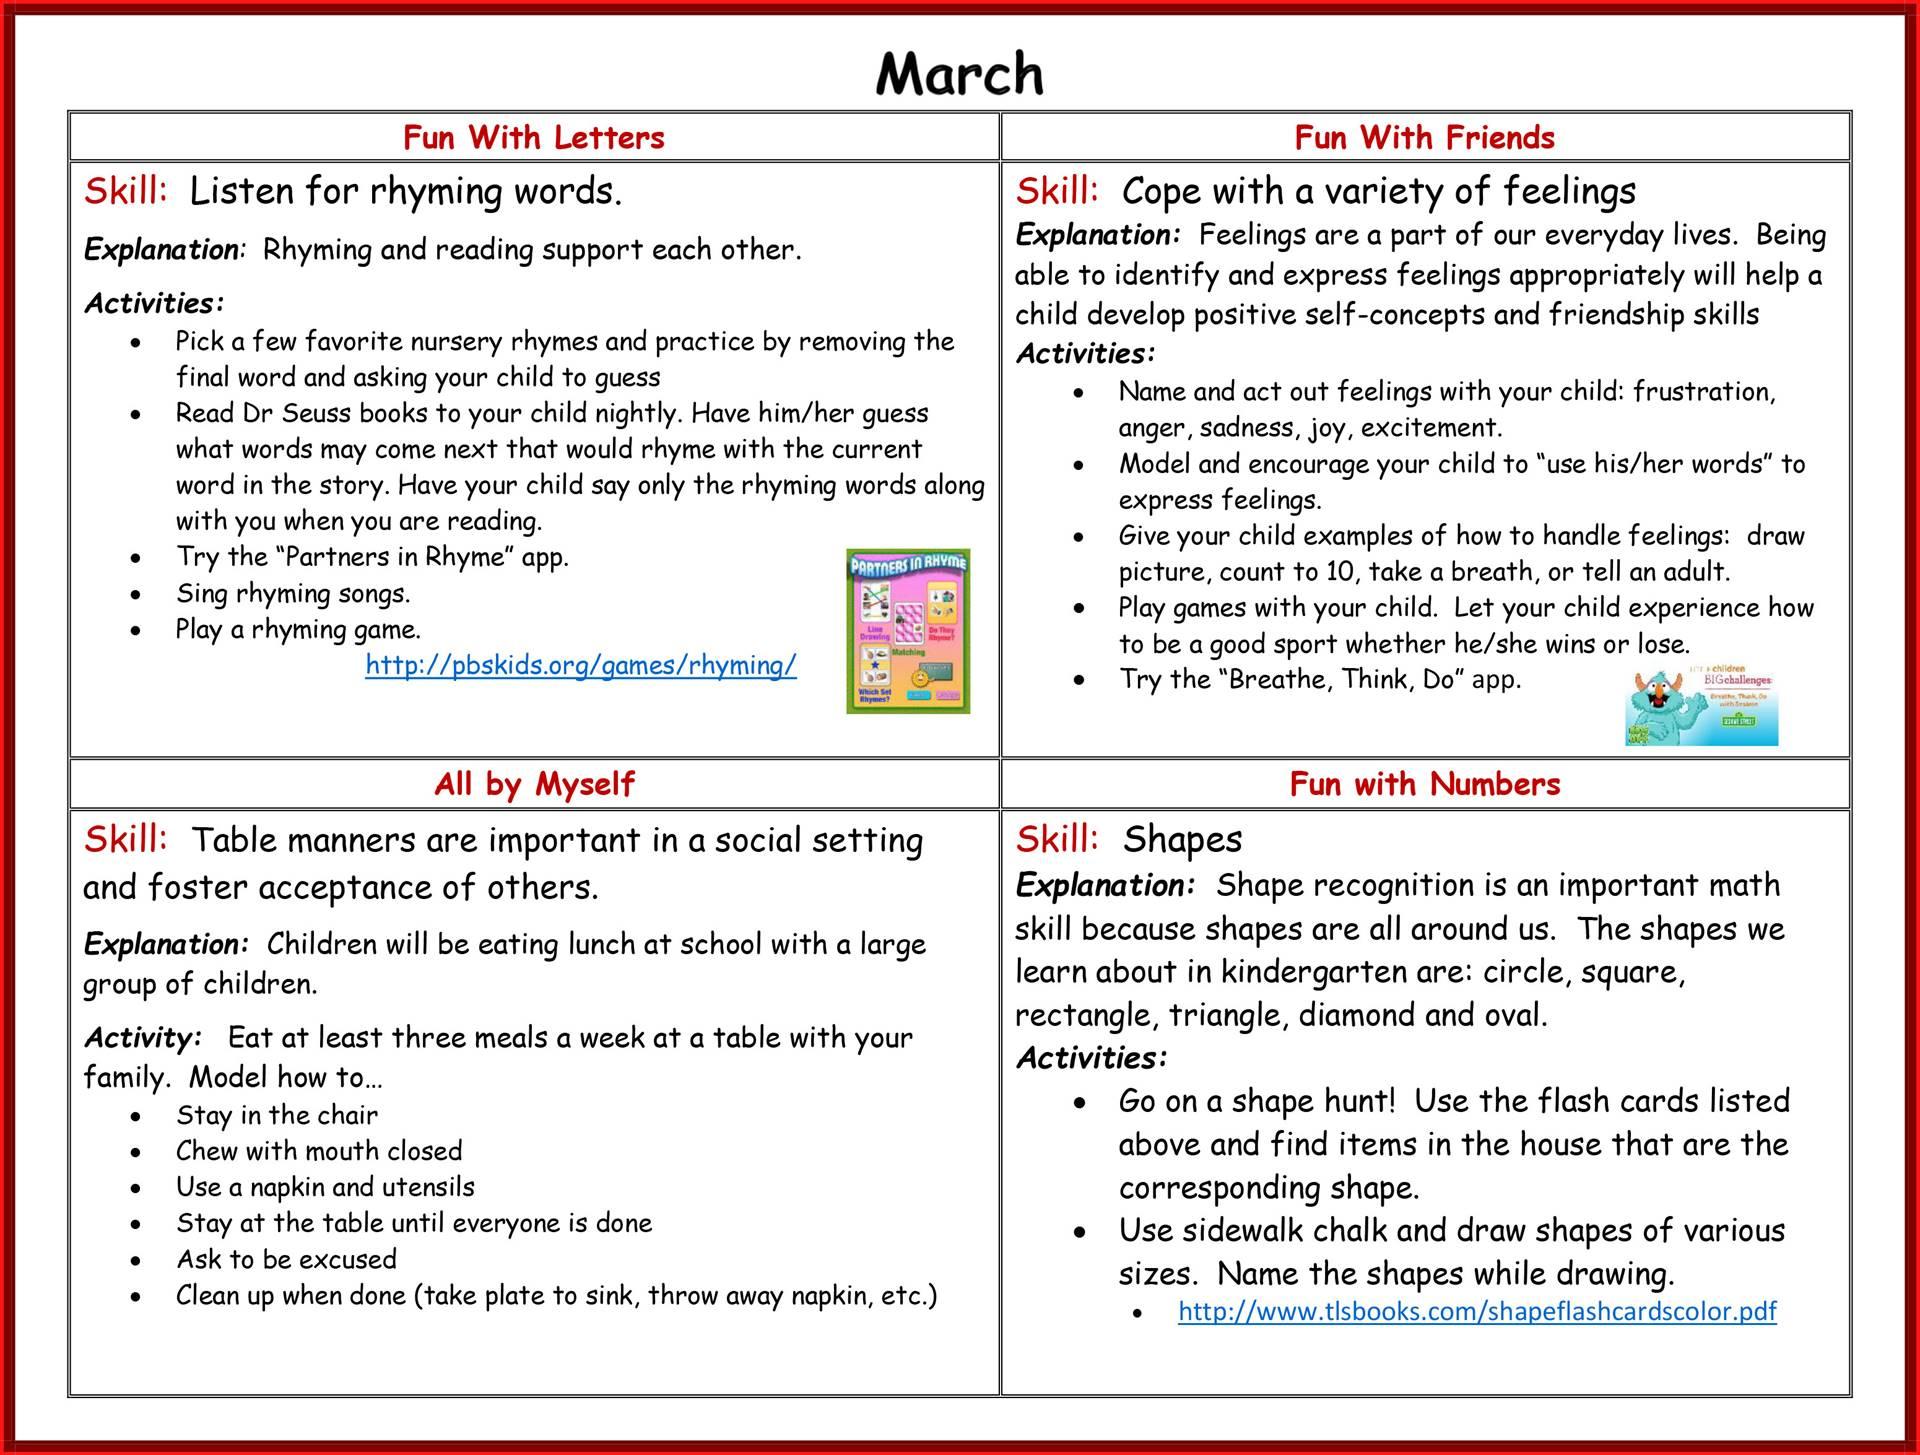 Kindergarten Readiness Calendar - March page 2